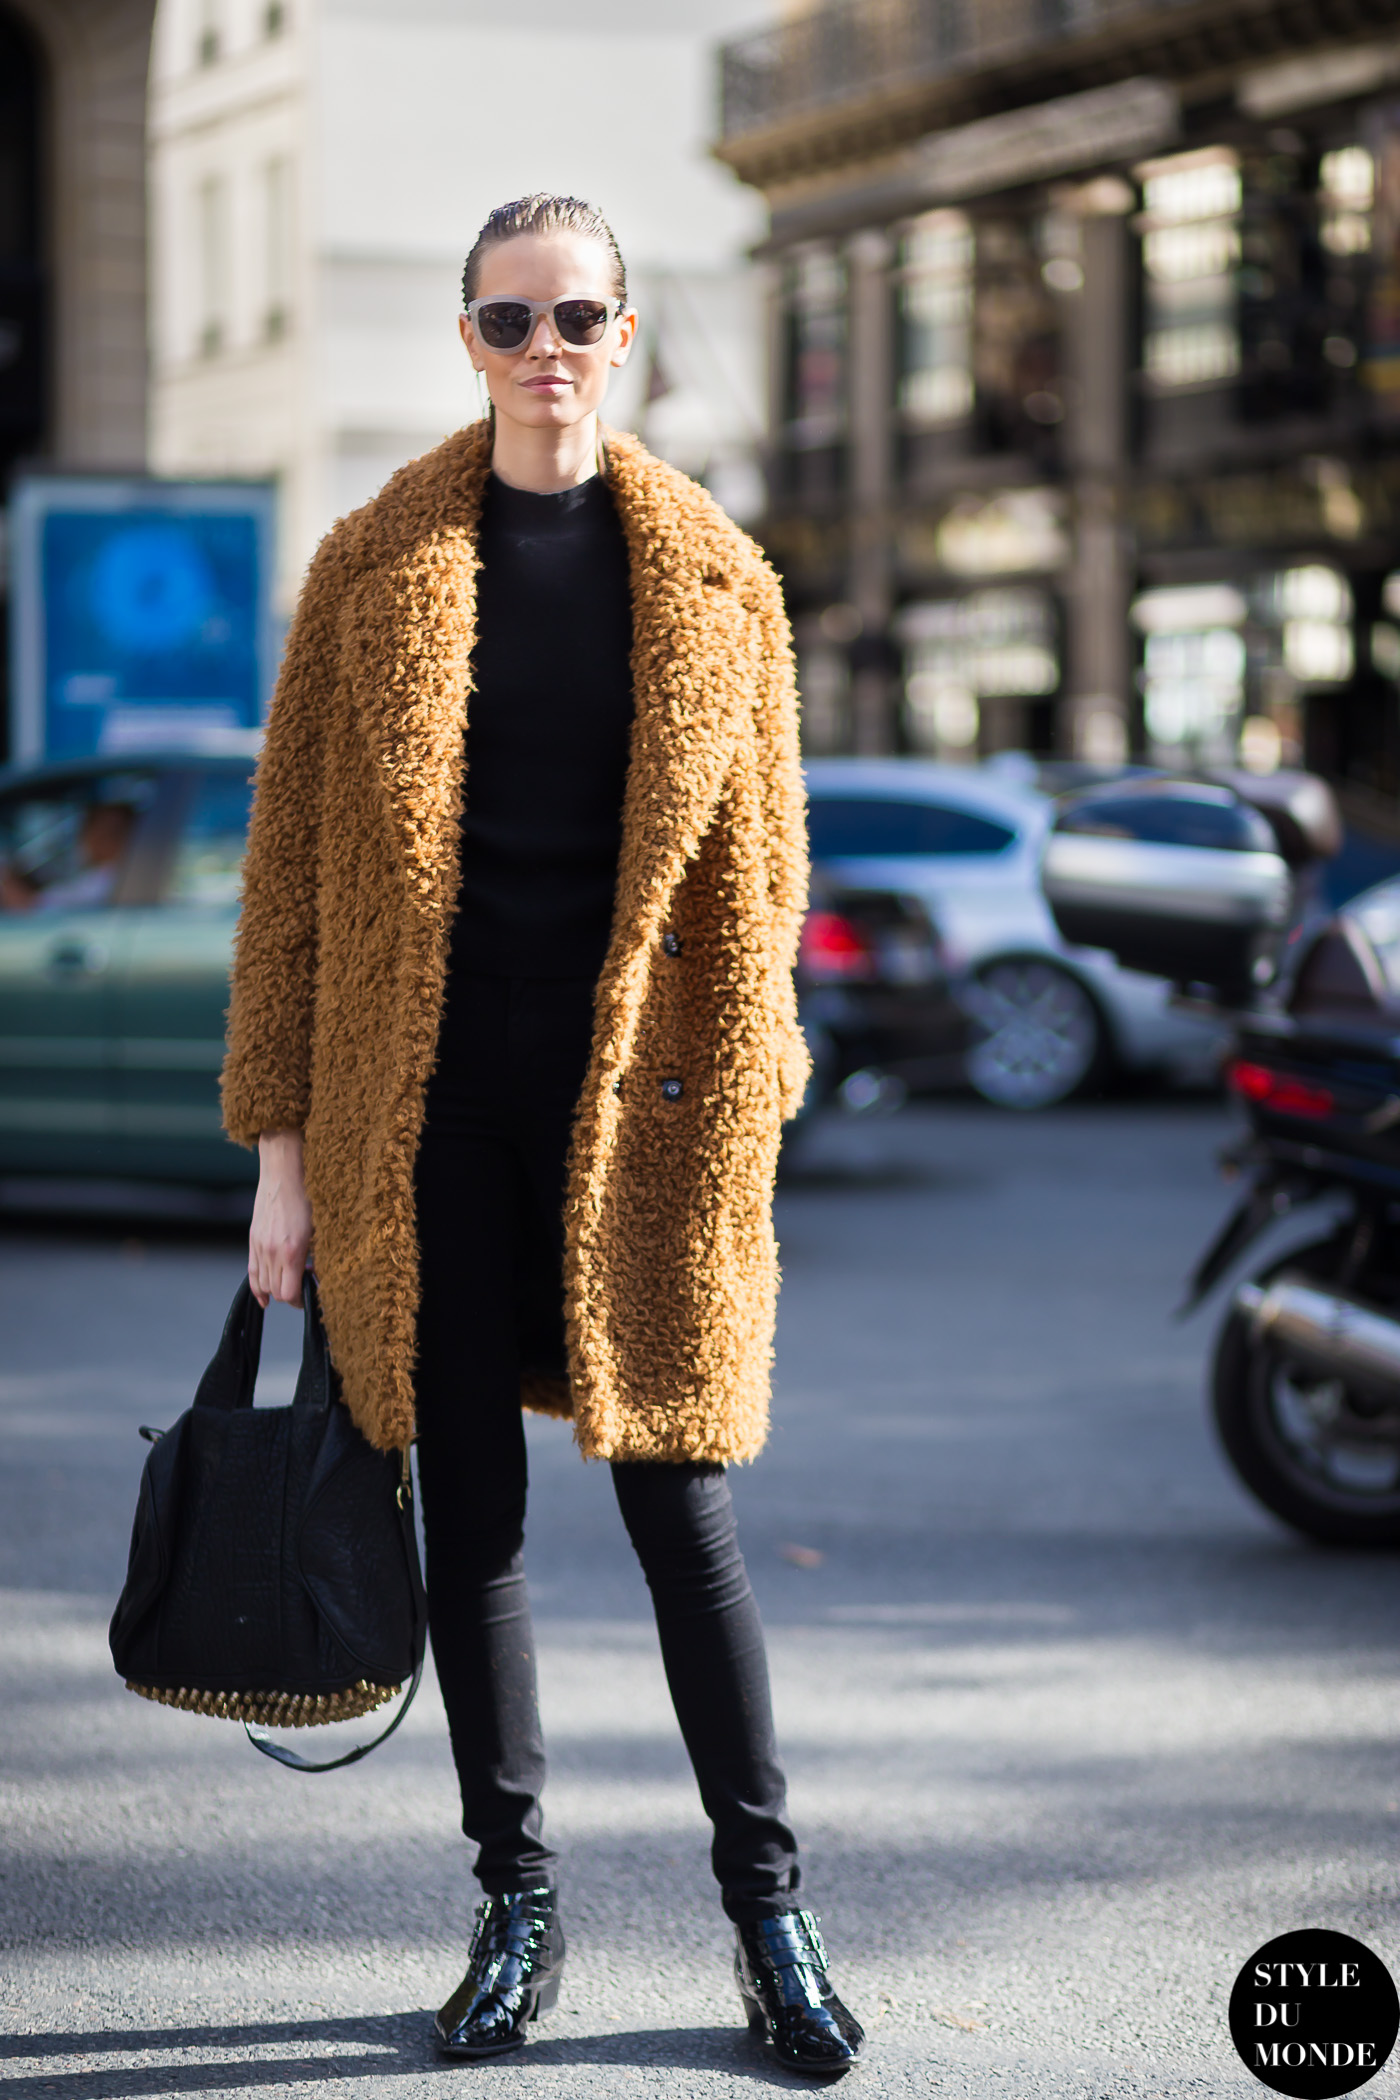 Paris Fashion Week Fw 2014 Street Style Mina Cvetkovic